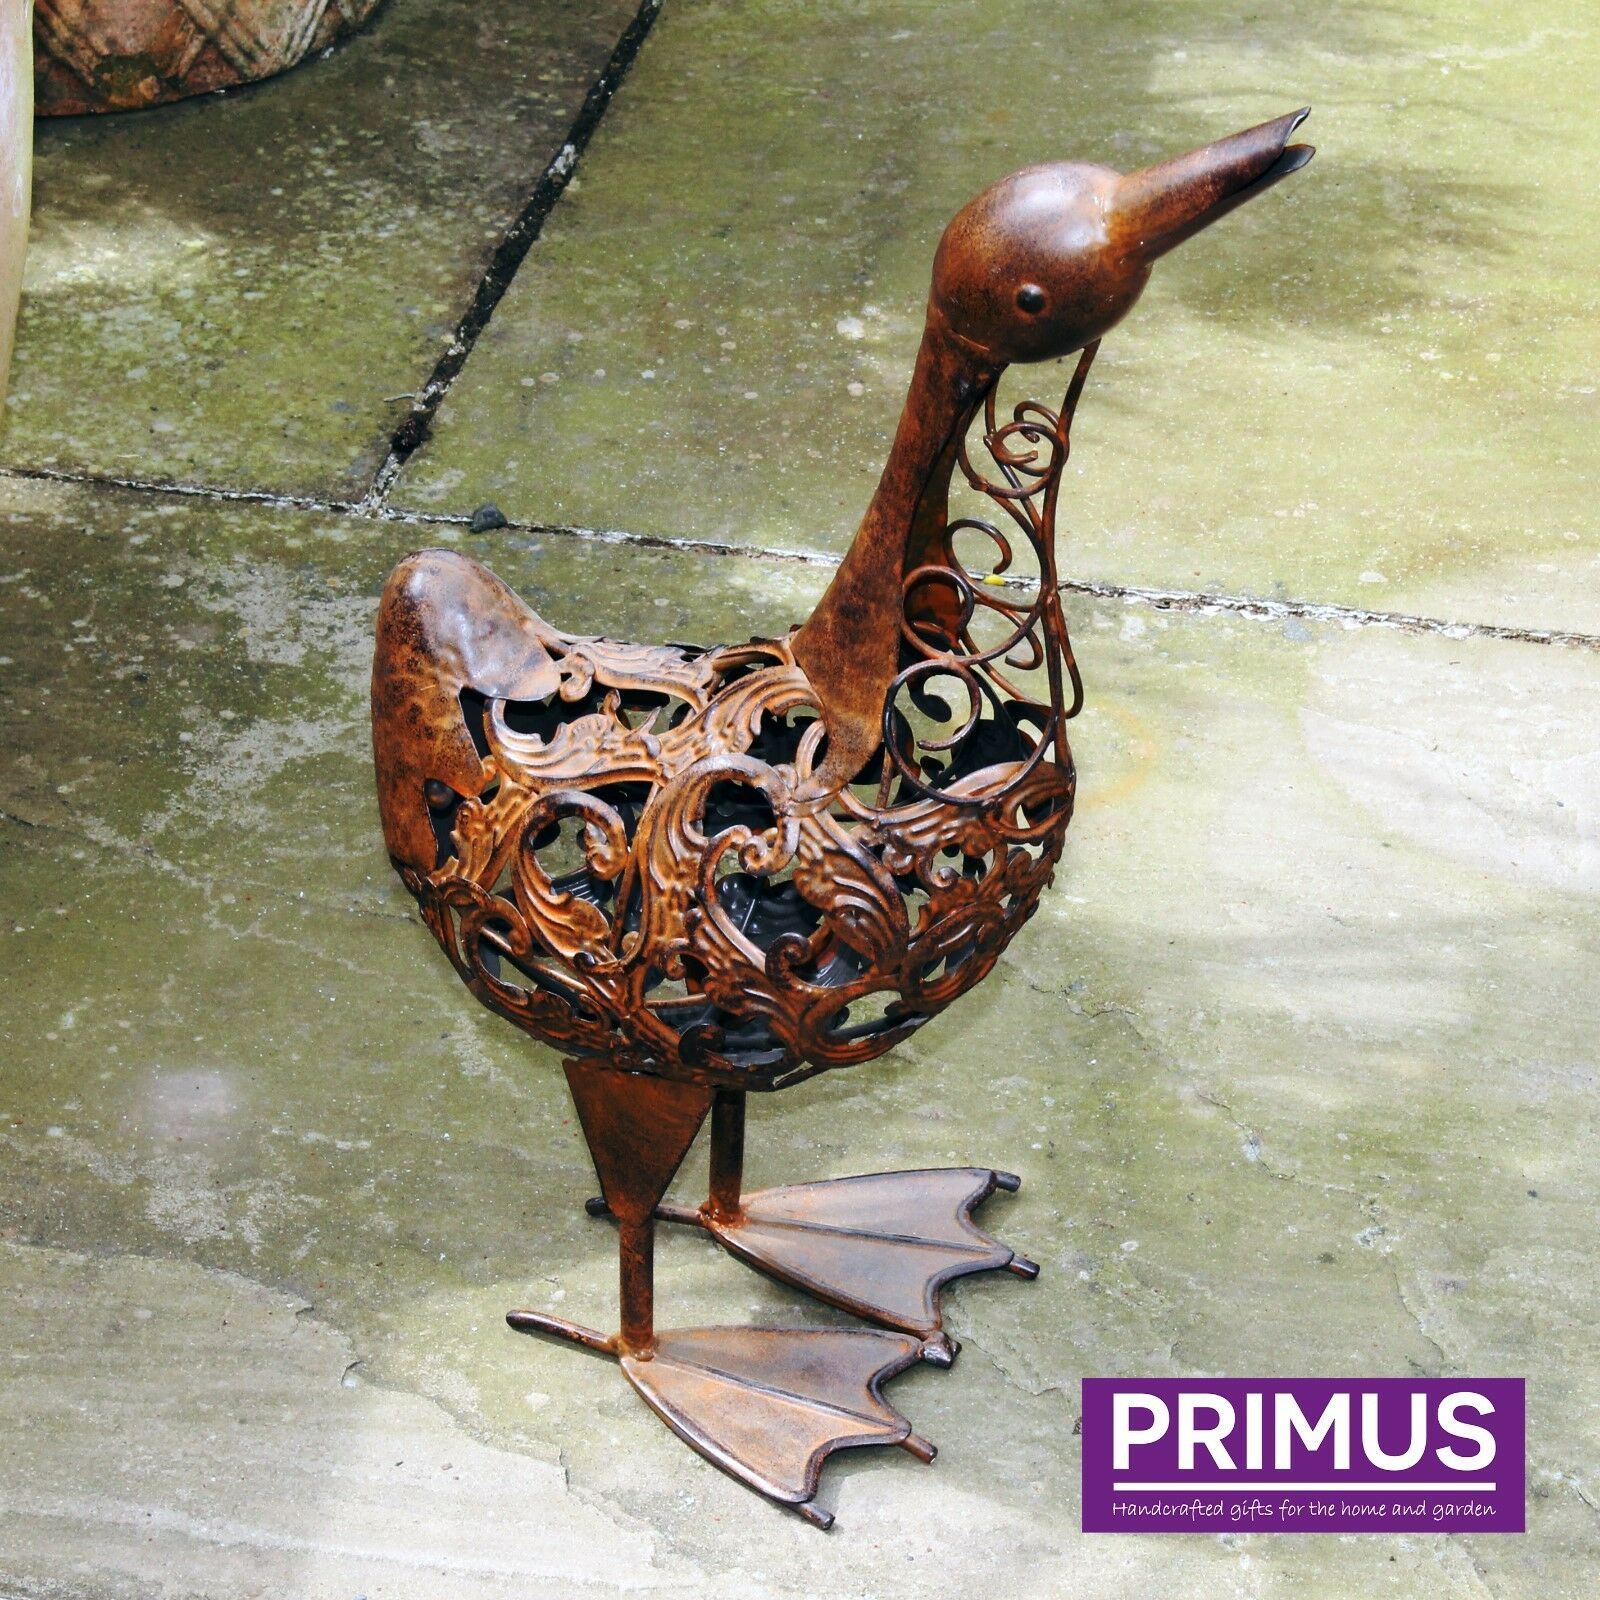 Primus Hand Crafted Metal Rusty Duck Garden Ornament Bird Sculpture Rustic Gift